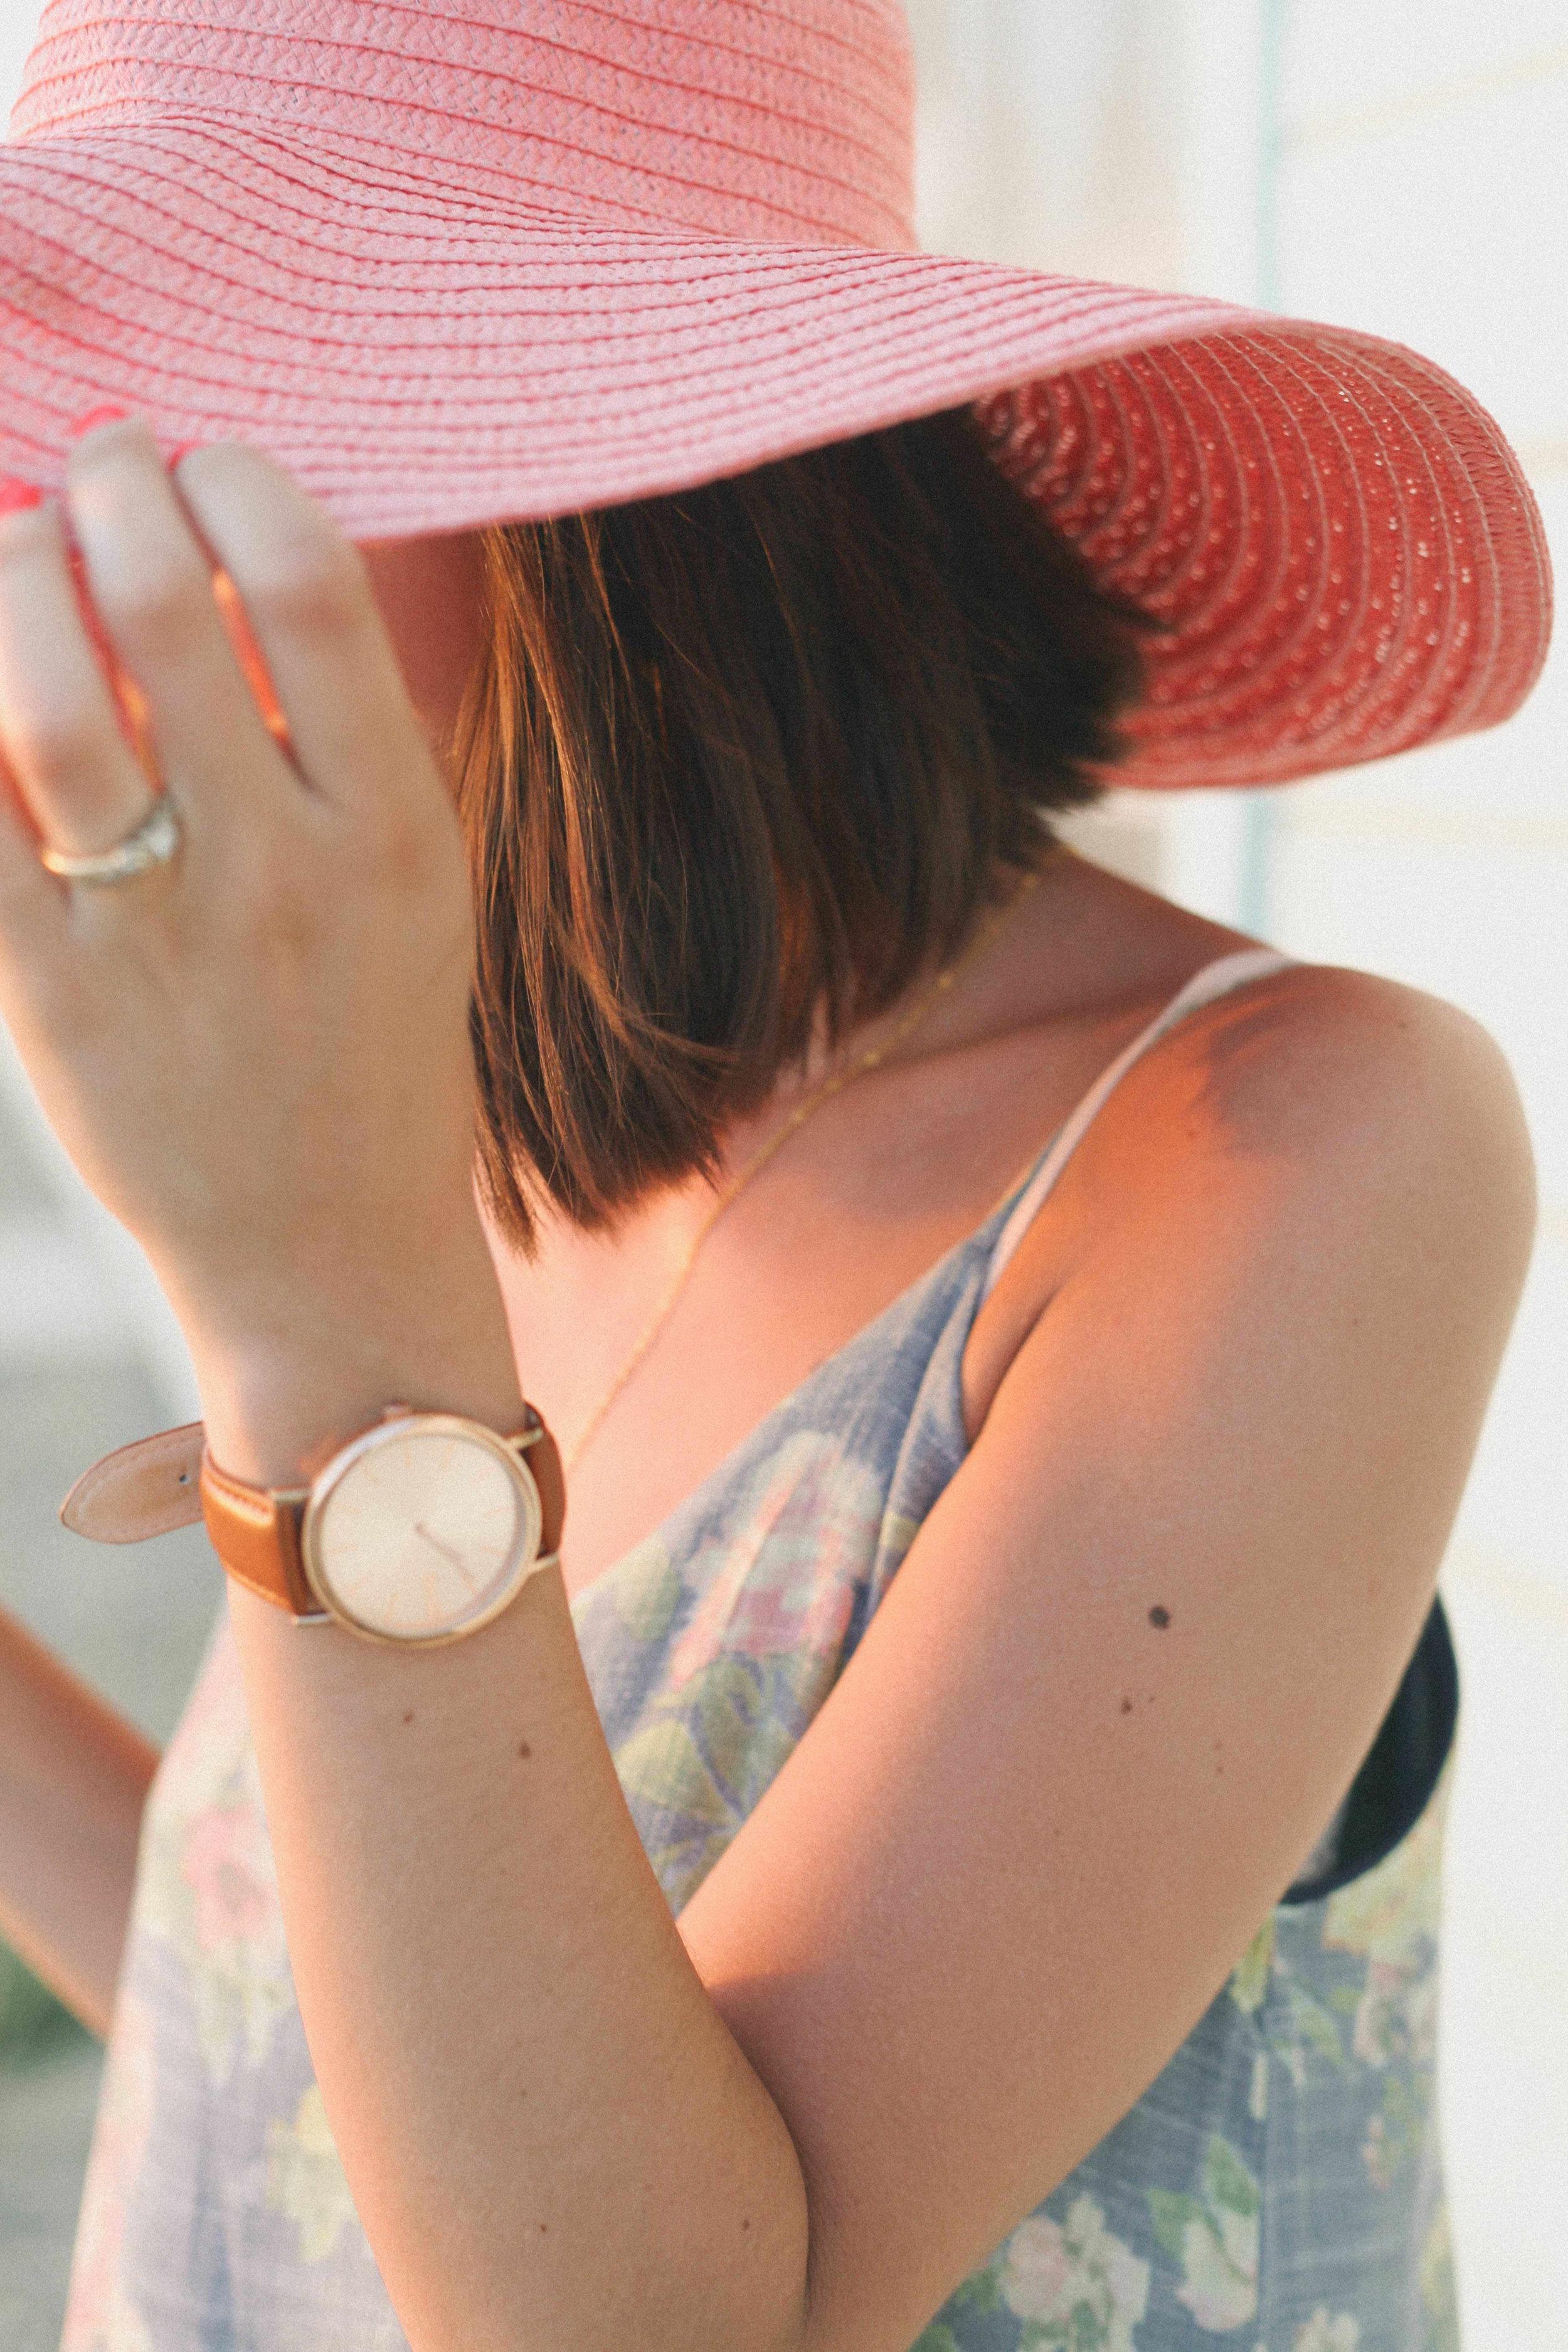 summer_desert_beachdress_style_fashion_treasuresandtravels-7.jpg